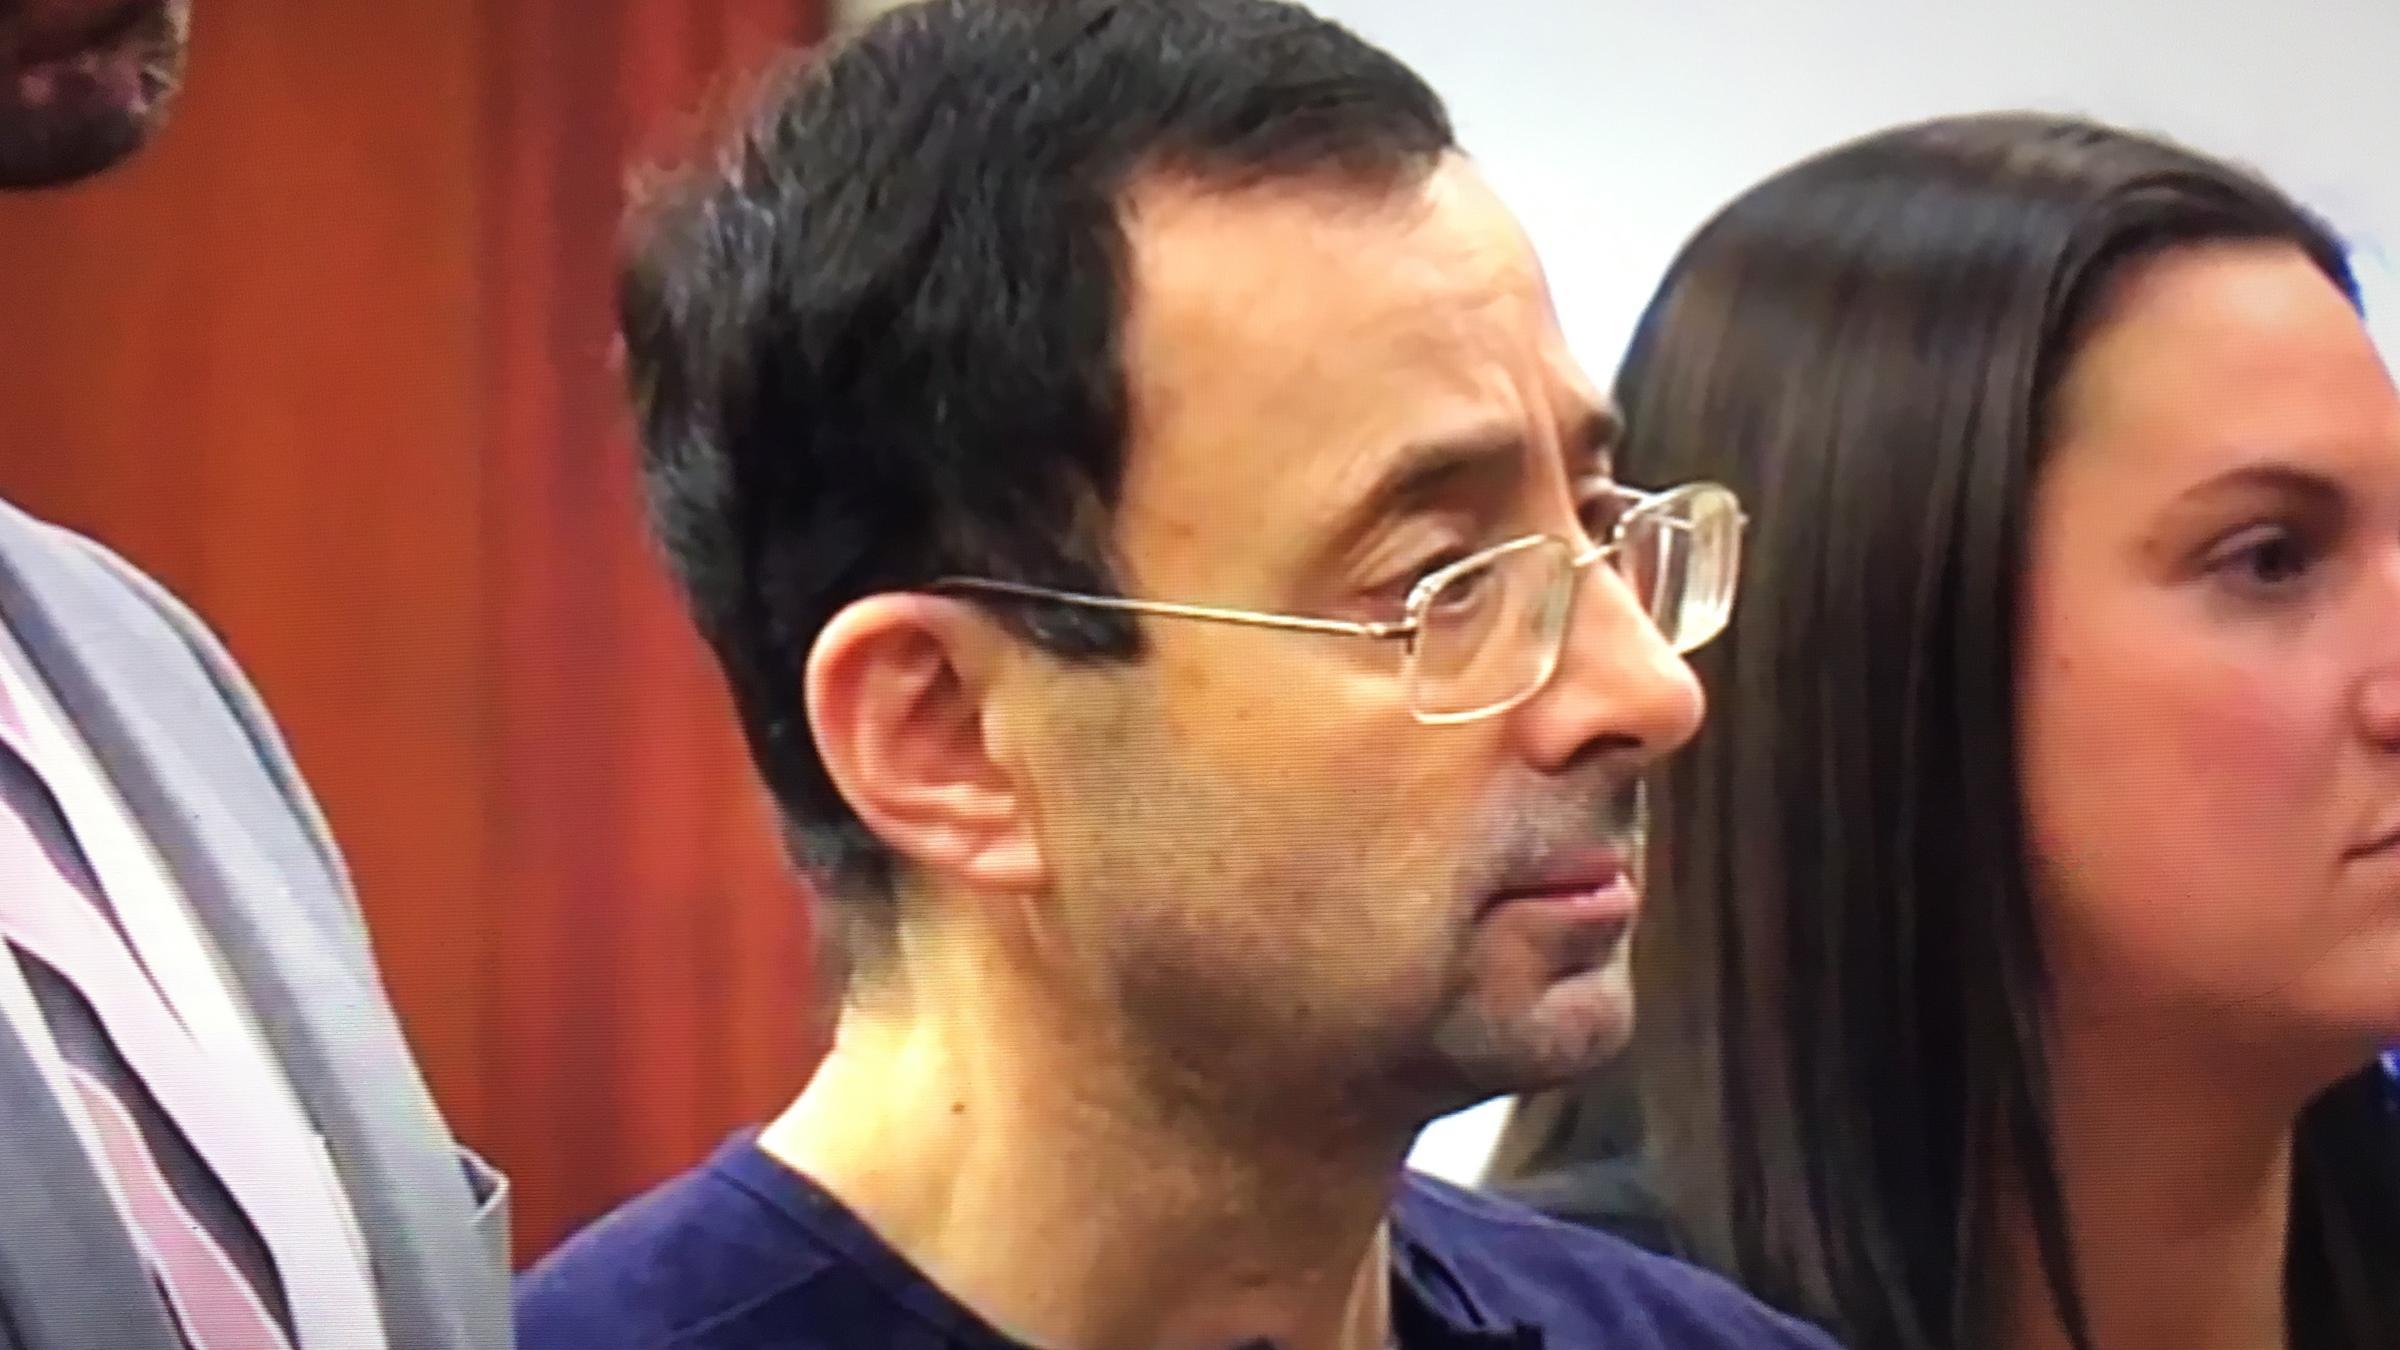 Top gymnastics coach with ties to Larry Nassar under investigation